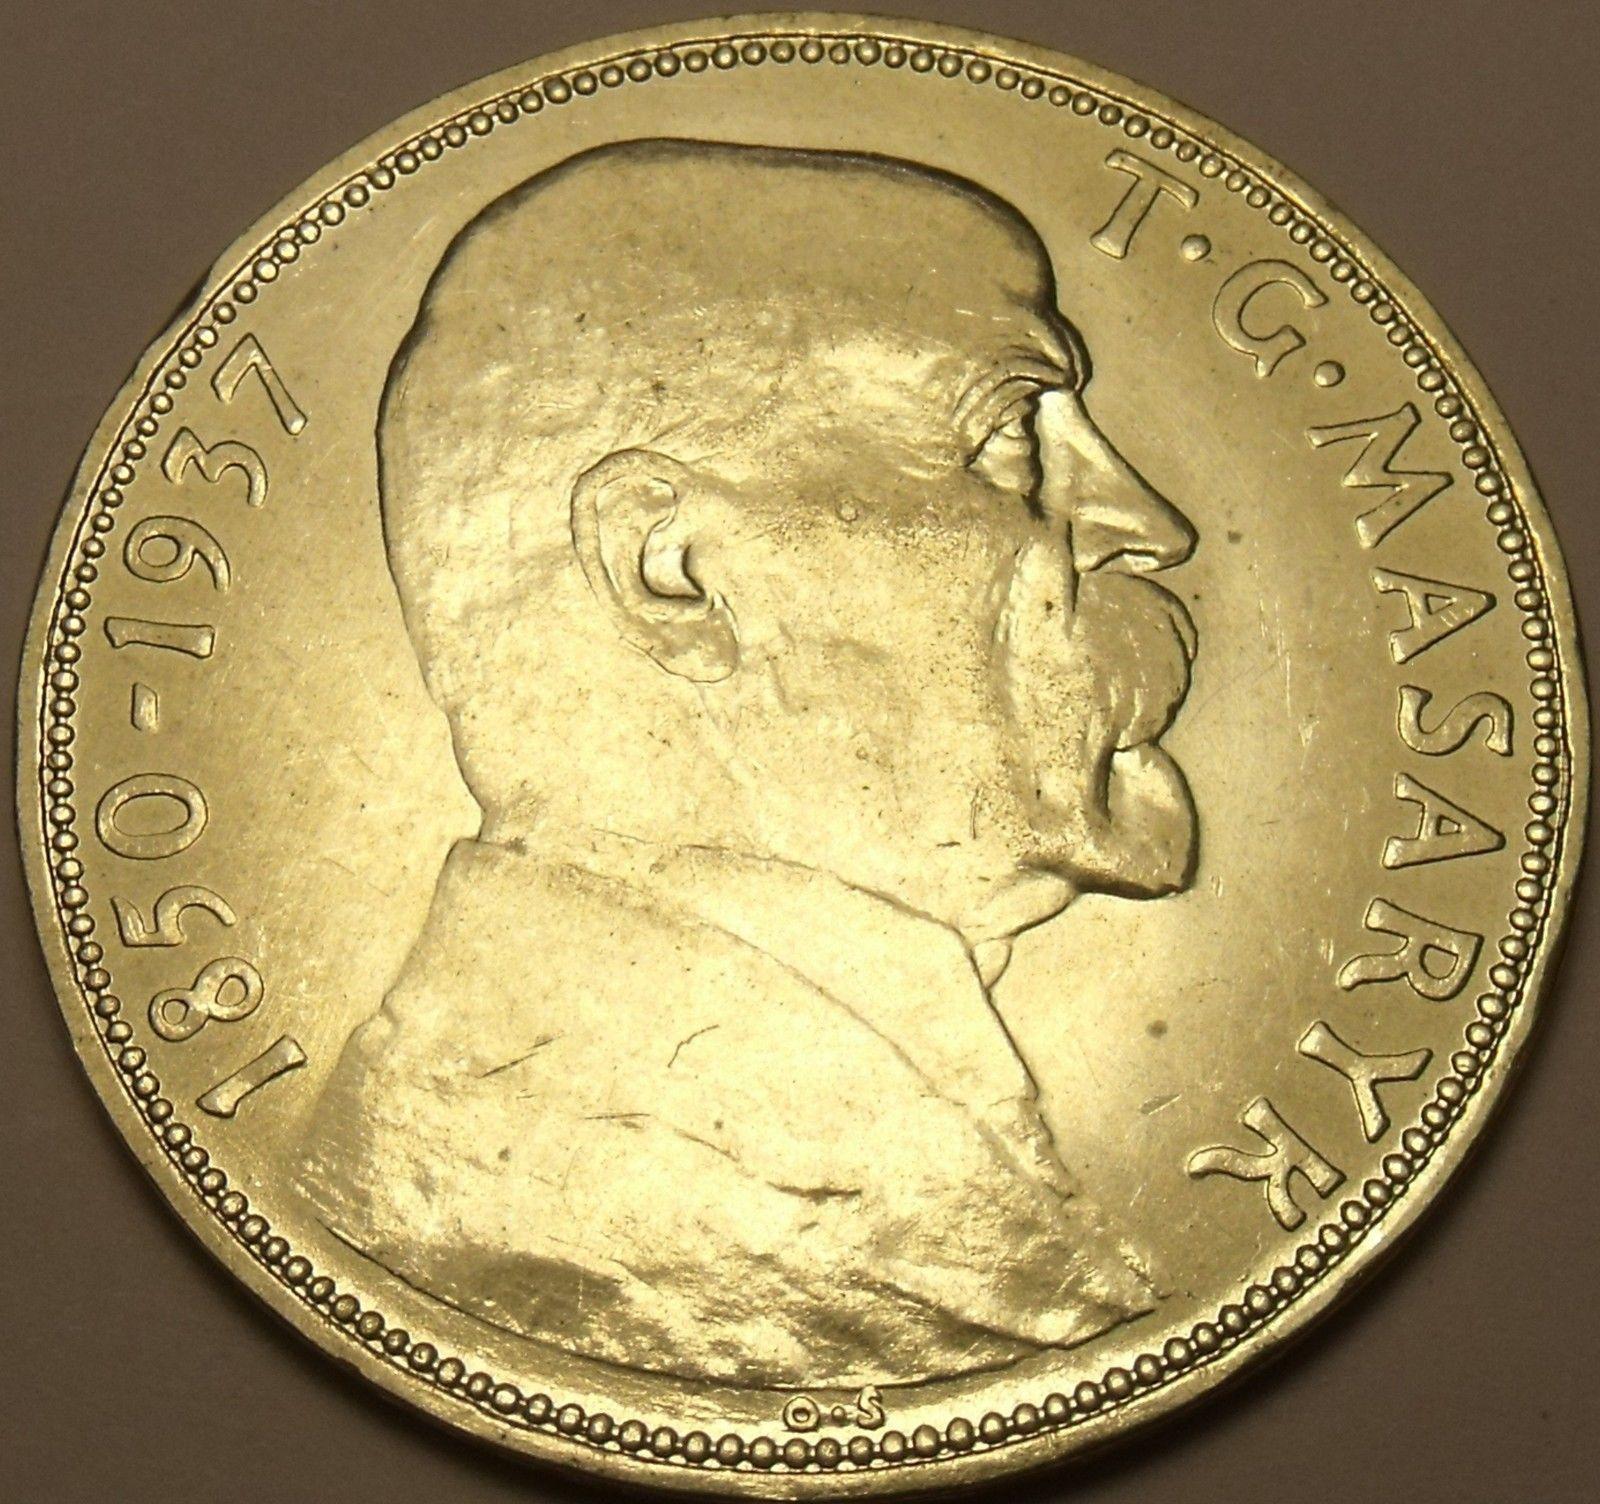 Unc Silver Czechoslovakia 1937 20 Kronun~Death Of President Masaryk~Free  Ship